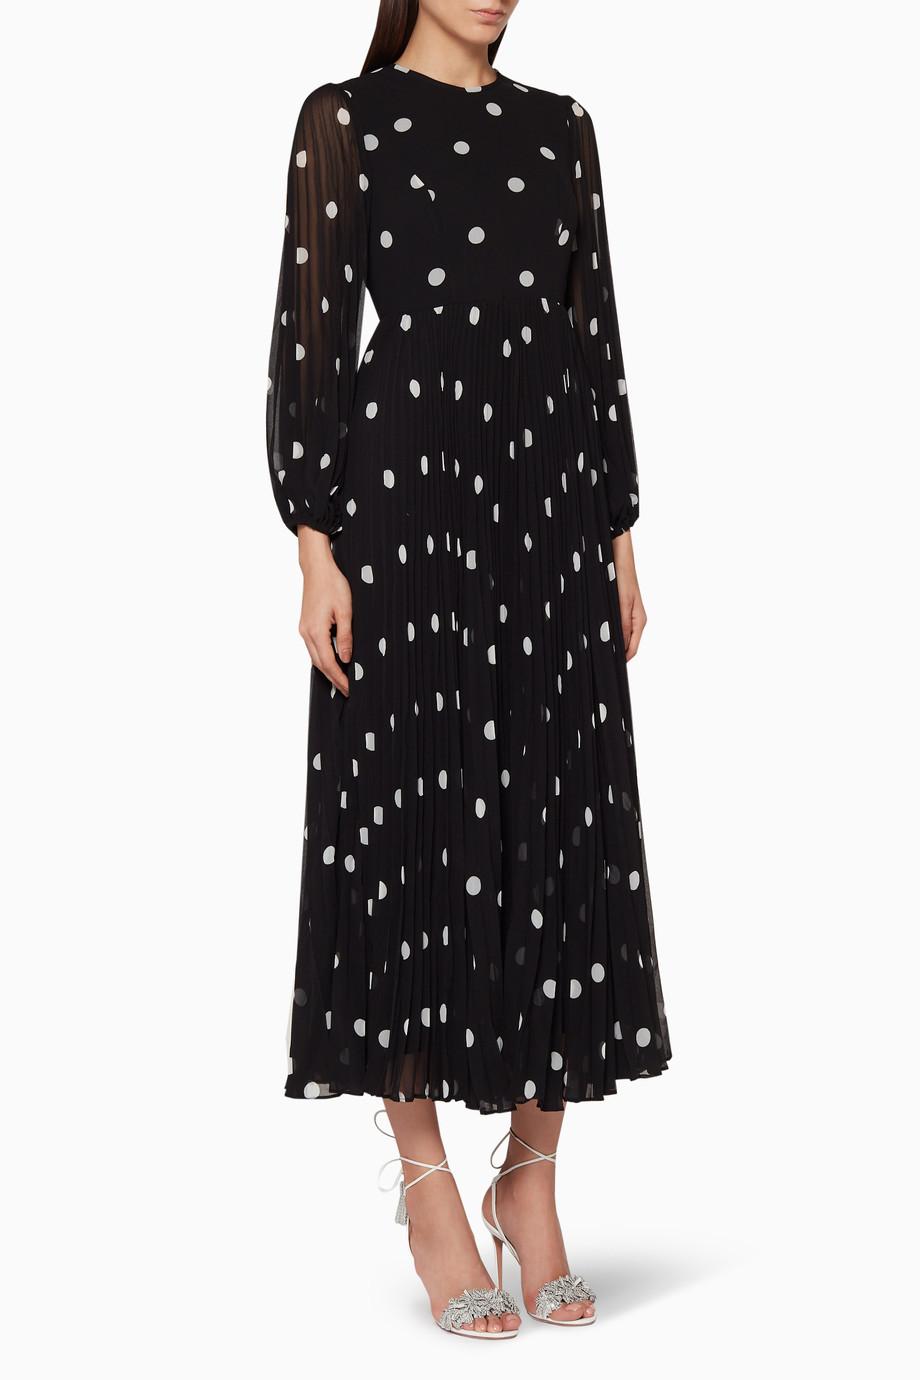 36821dd2d4b5 Shop Zimmermann Black Polka-Dot Sunray Pleated Dress for Women ...